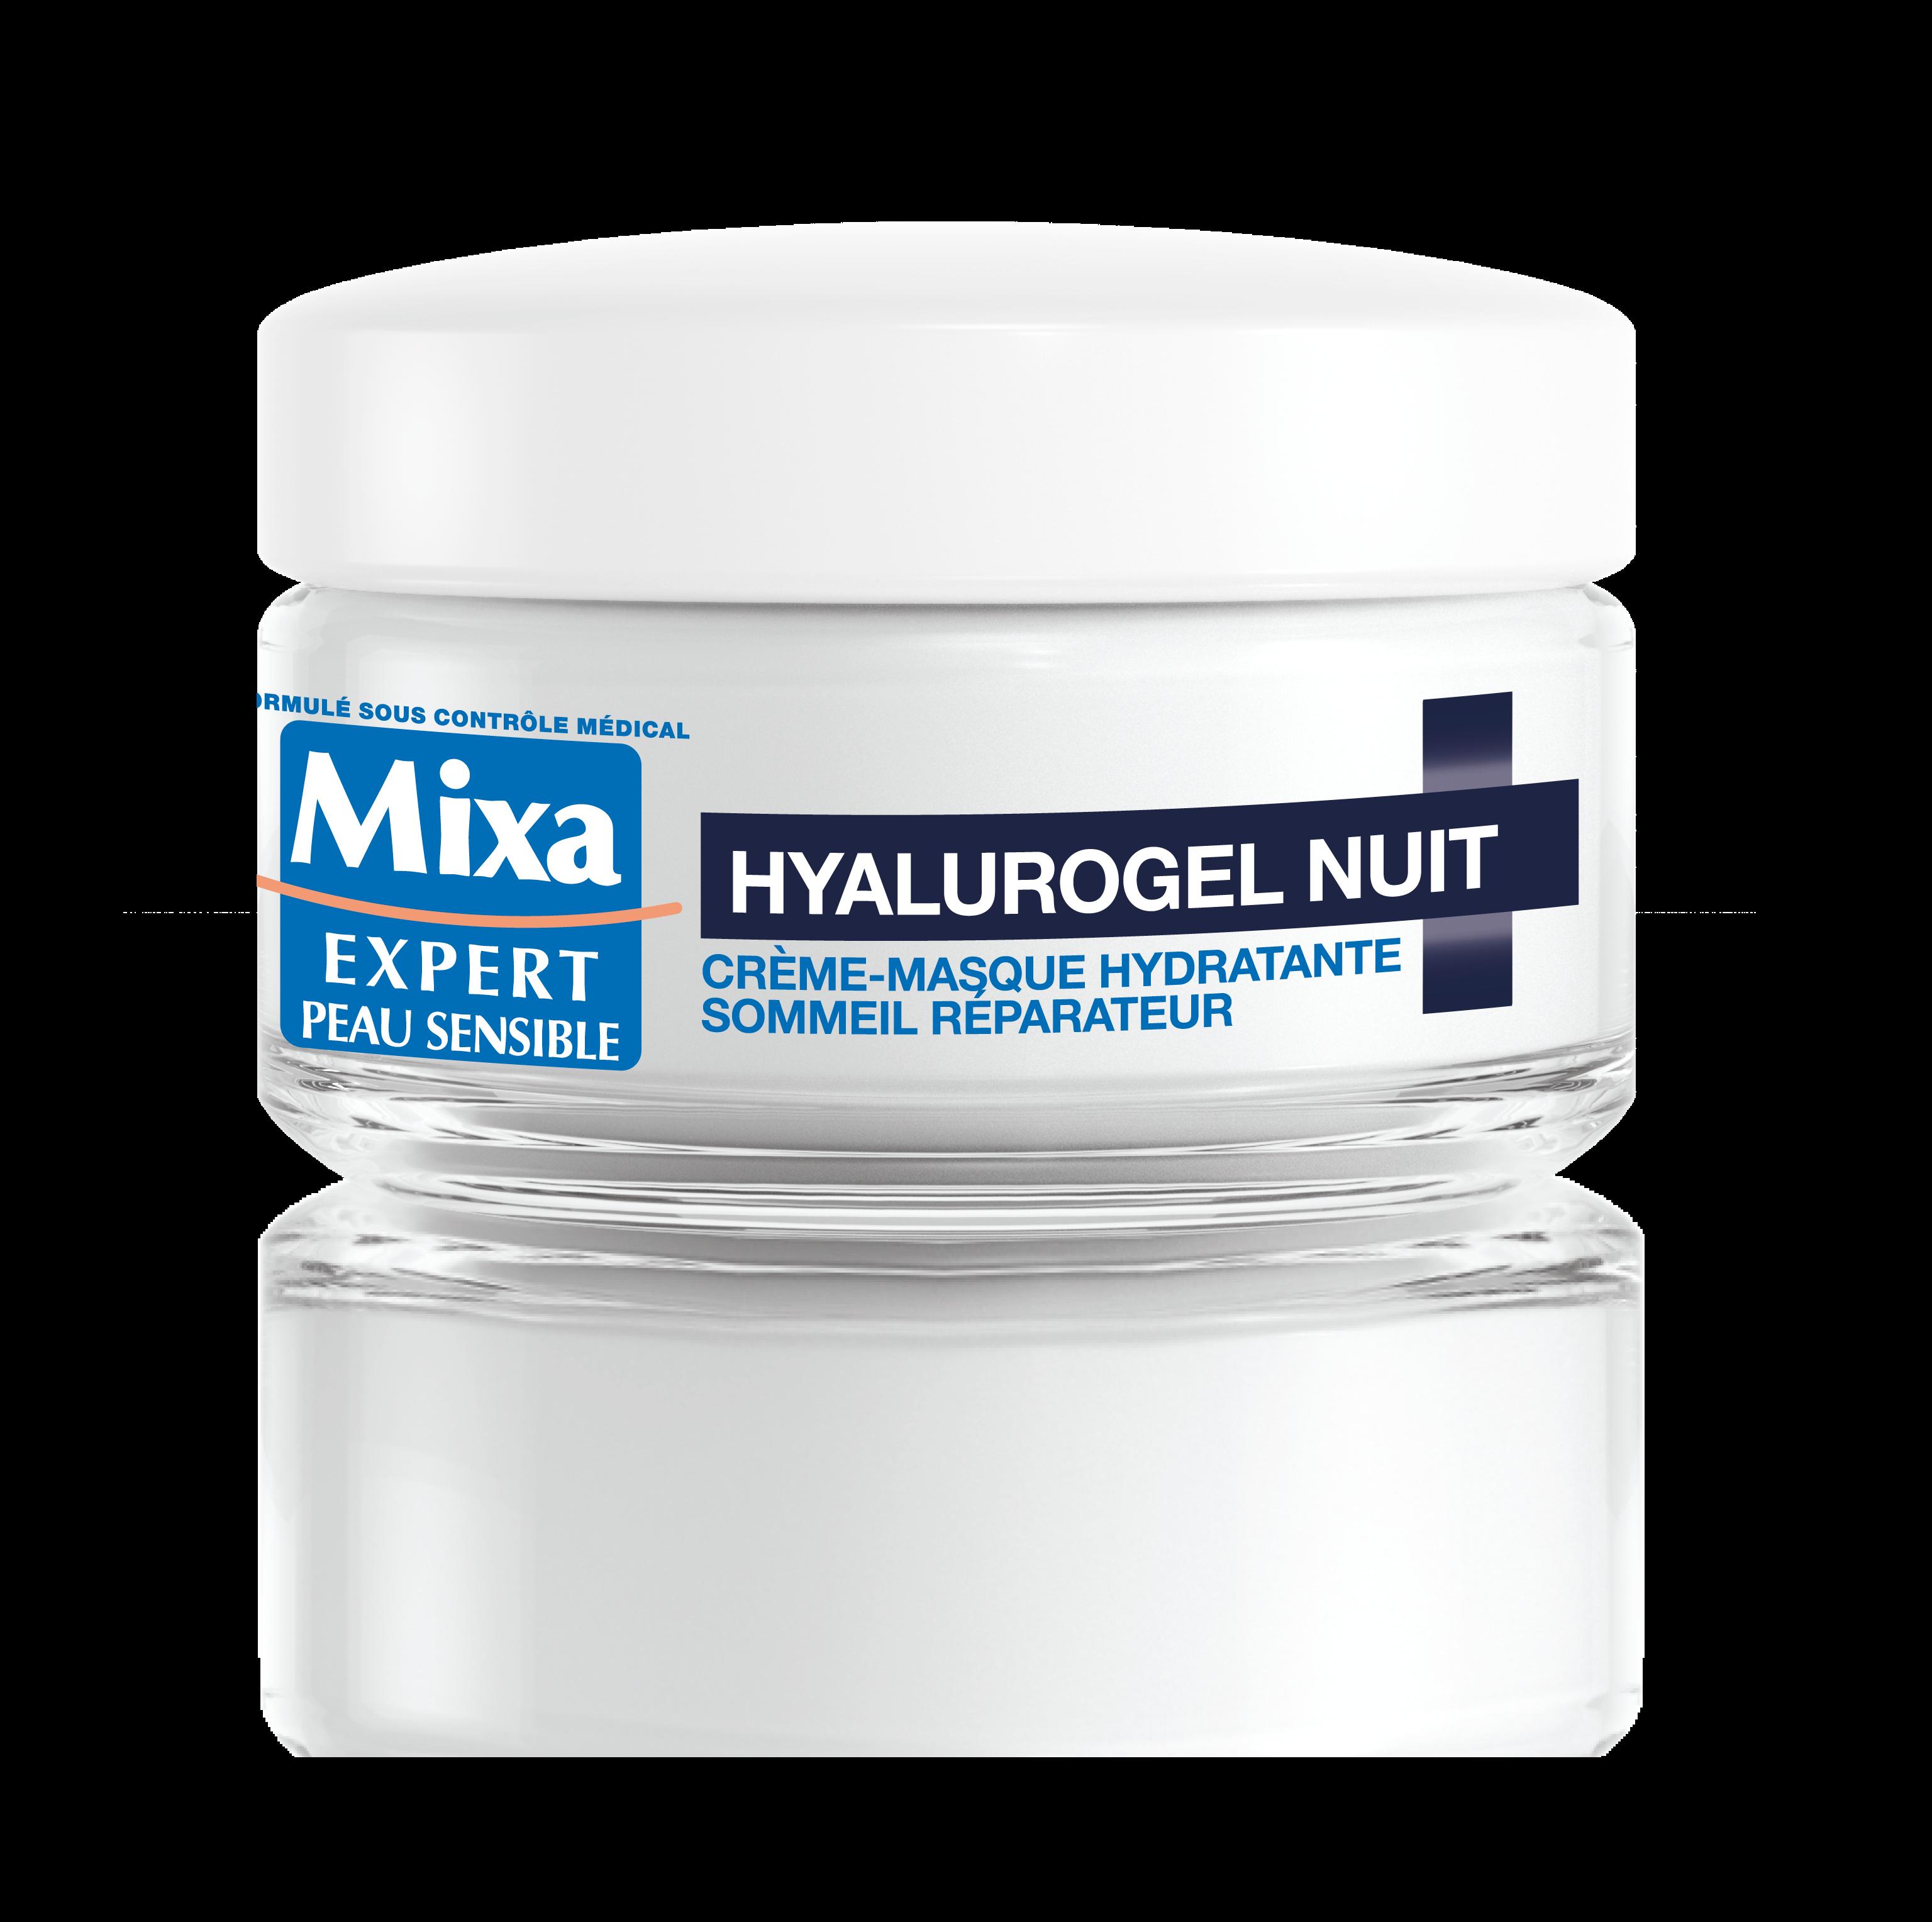 Mixa Hyalurogel Nuit